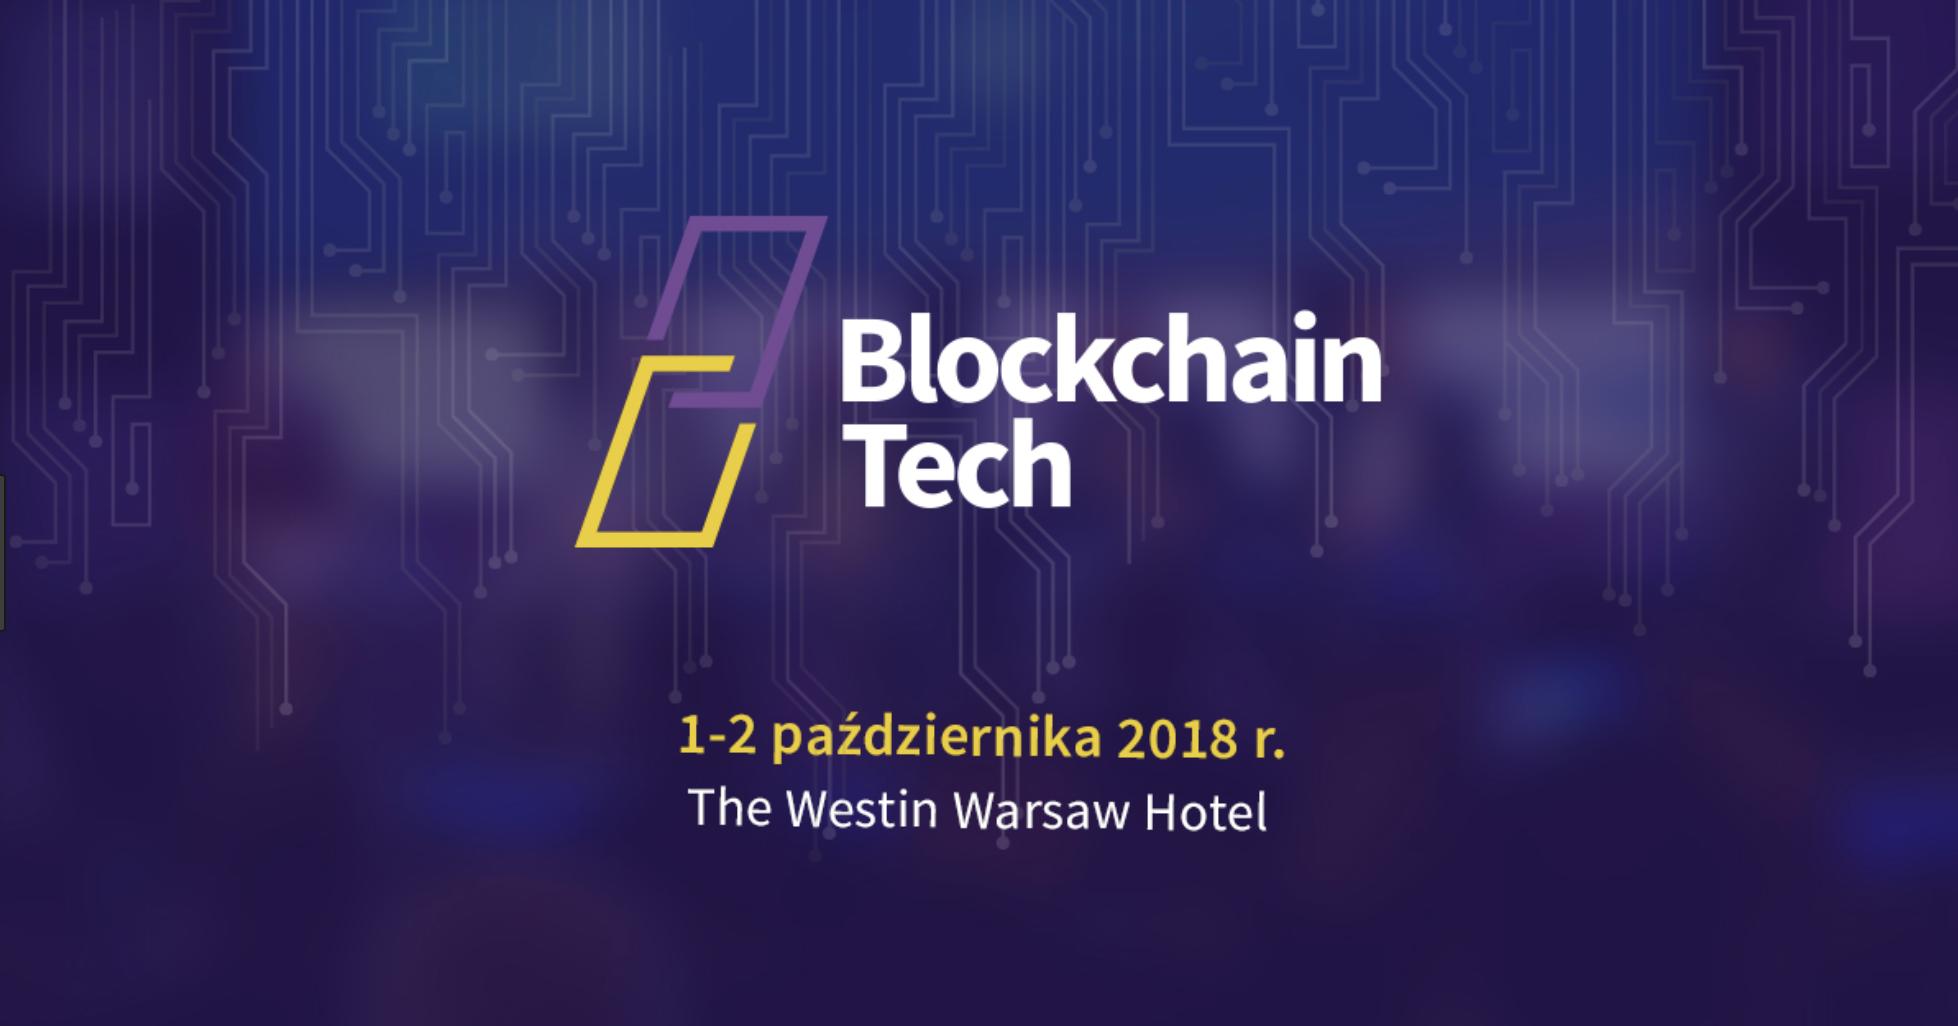 BlockchainTech II conference Norbert Biedrzycki